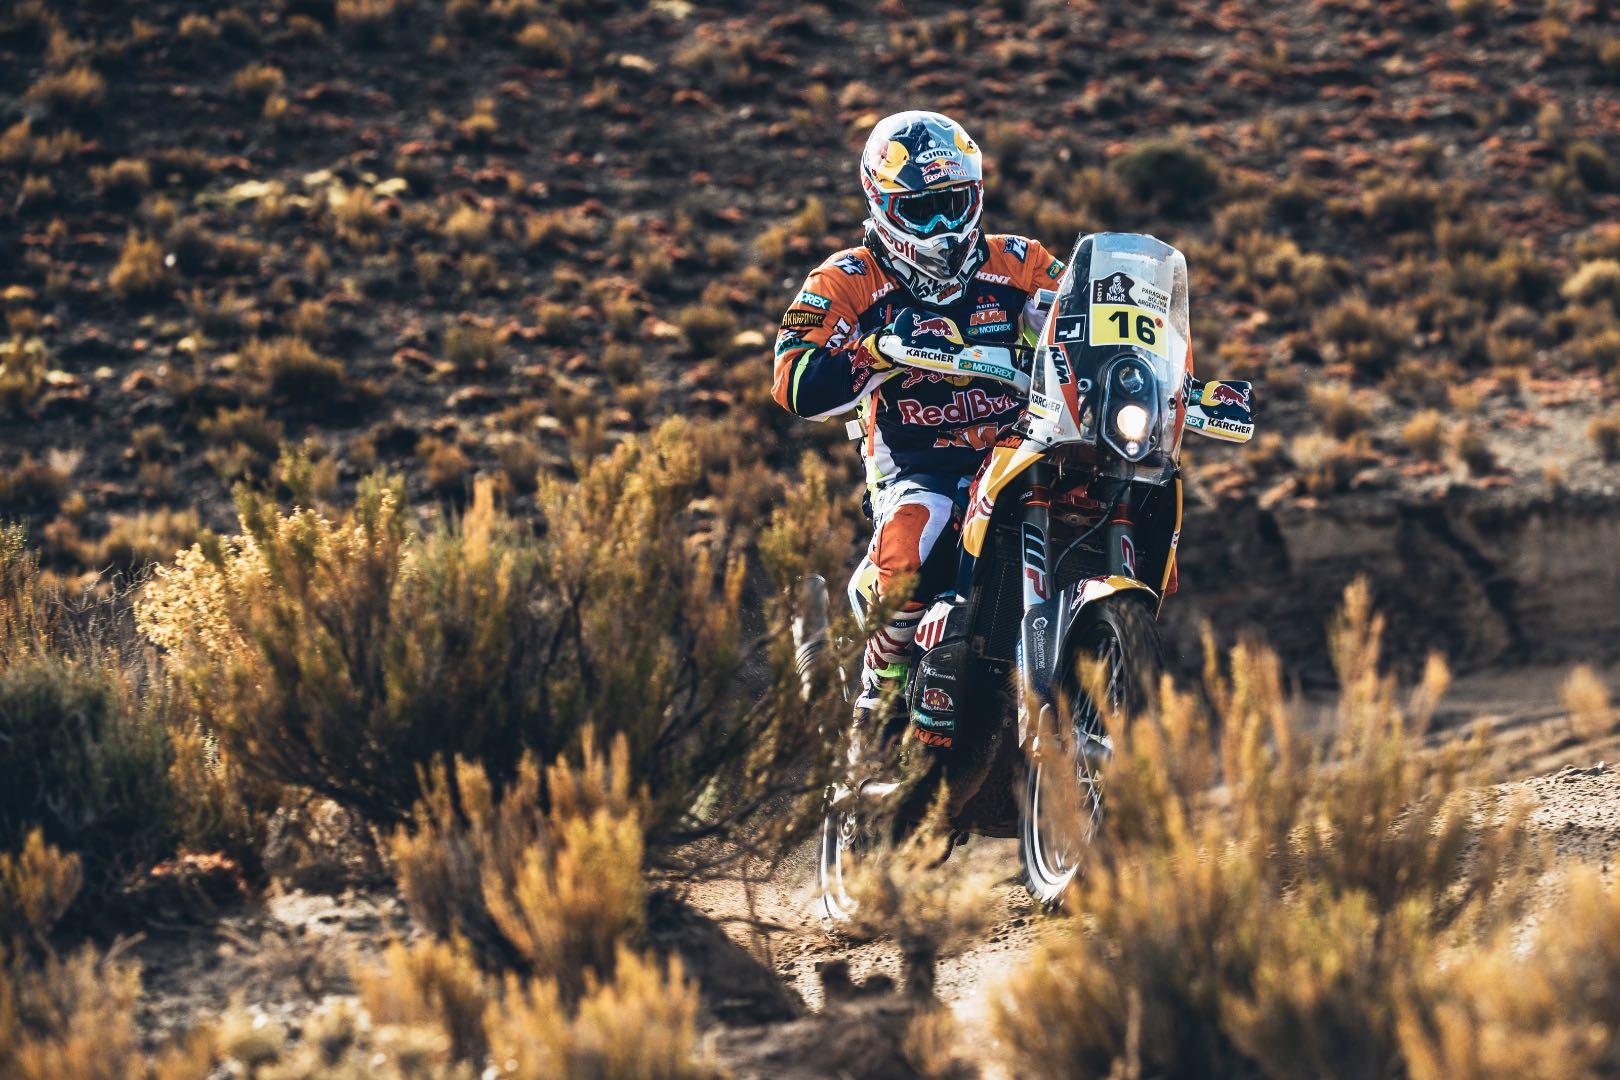 2017 Dakar Rally Stage 4: Lighting Strikes Ivan Jakes, Bittersweet for KTM